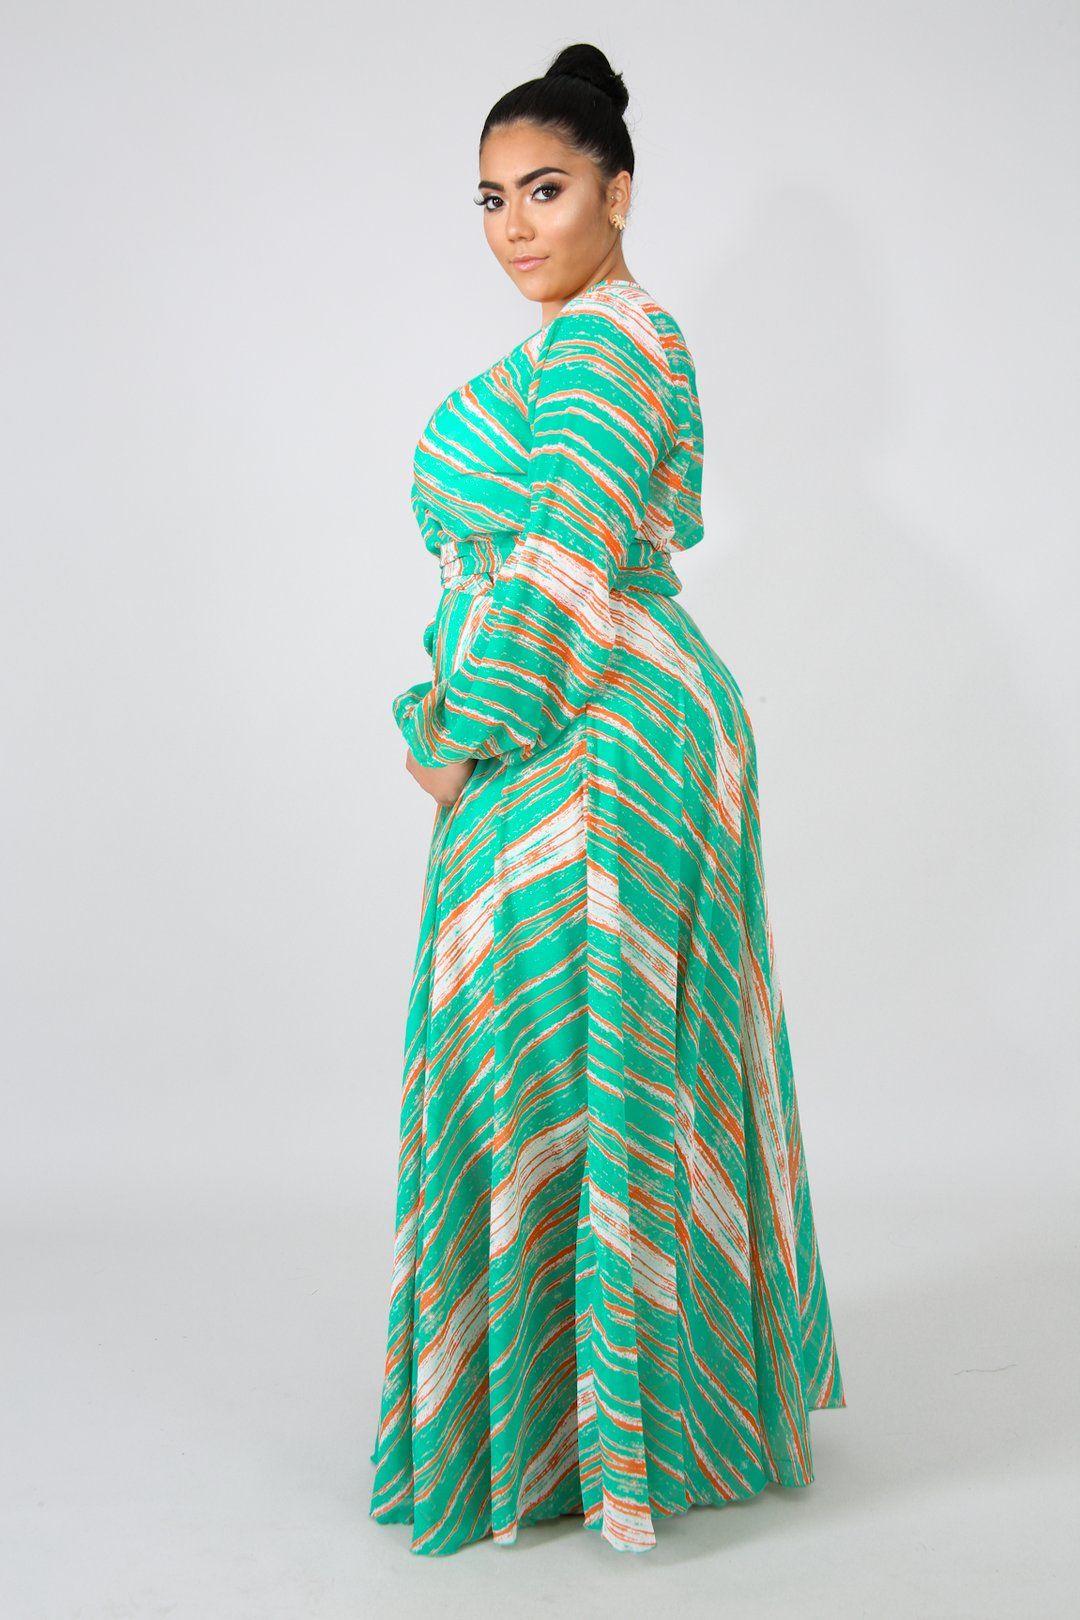 Green Dazzling Color Maxi Dress Style 2144p Greendescriptionthis Dazzling Color Maxi Dress Features A Non Stretch Maxi Dress Plus Size Maxi Dresses Dresses [ 1620 x 1080 Pixel ]